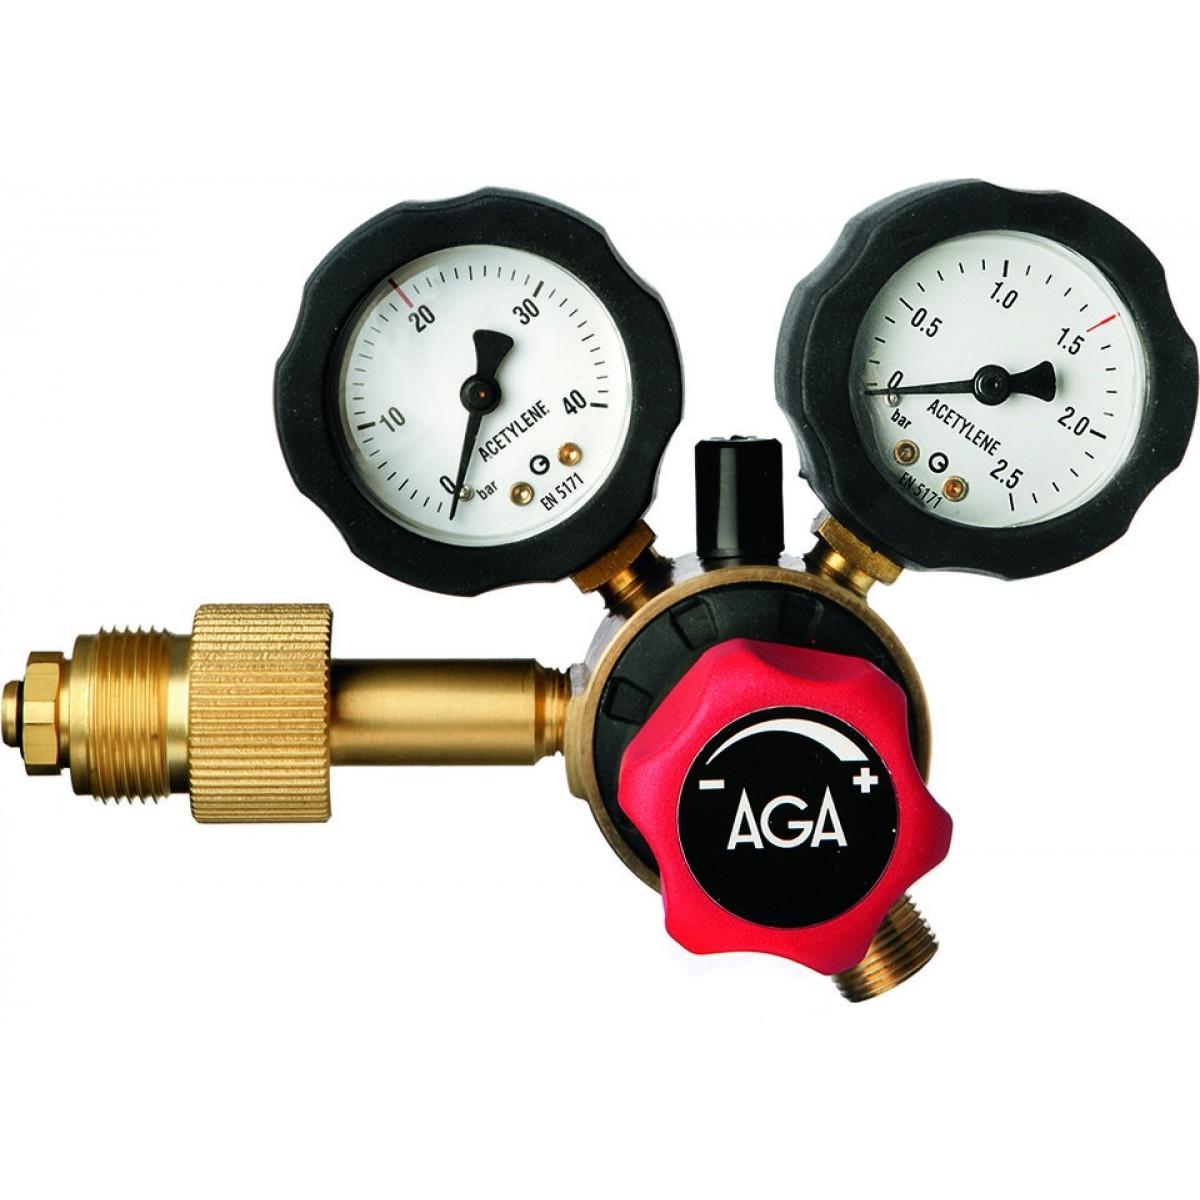 AGA Gas regulator Fixicontrol-31